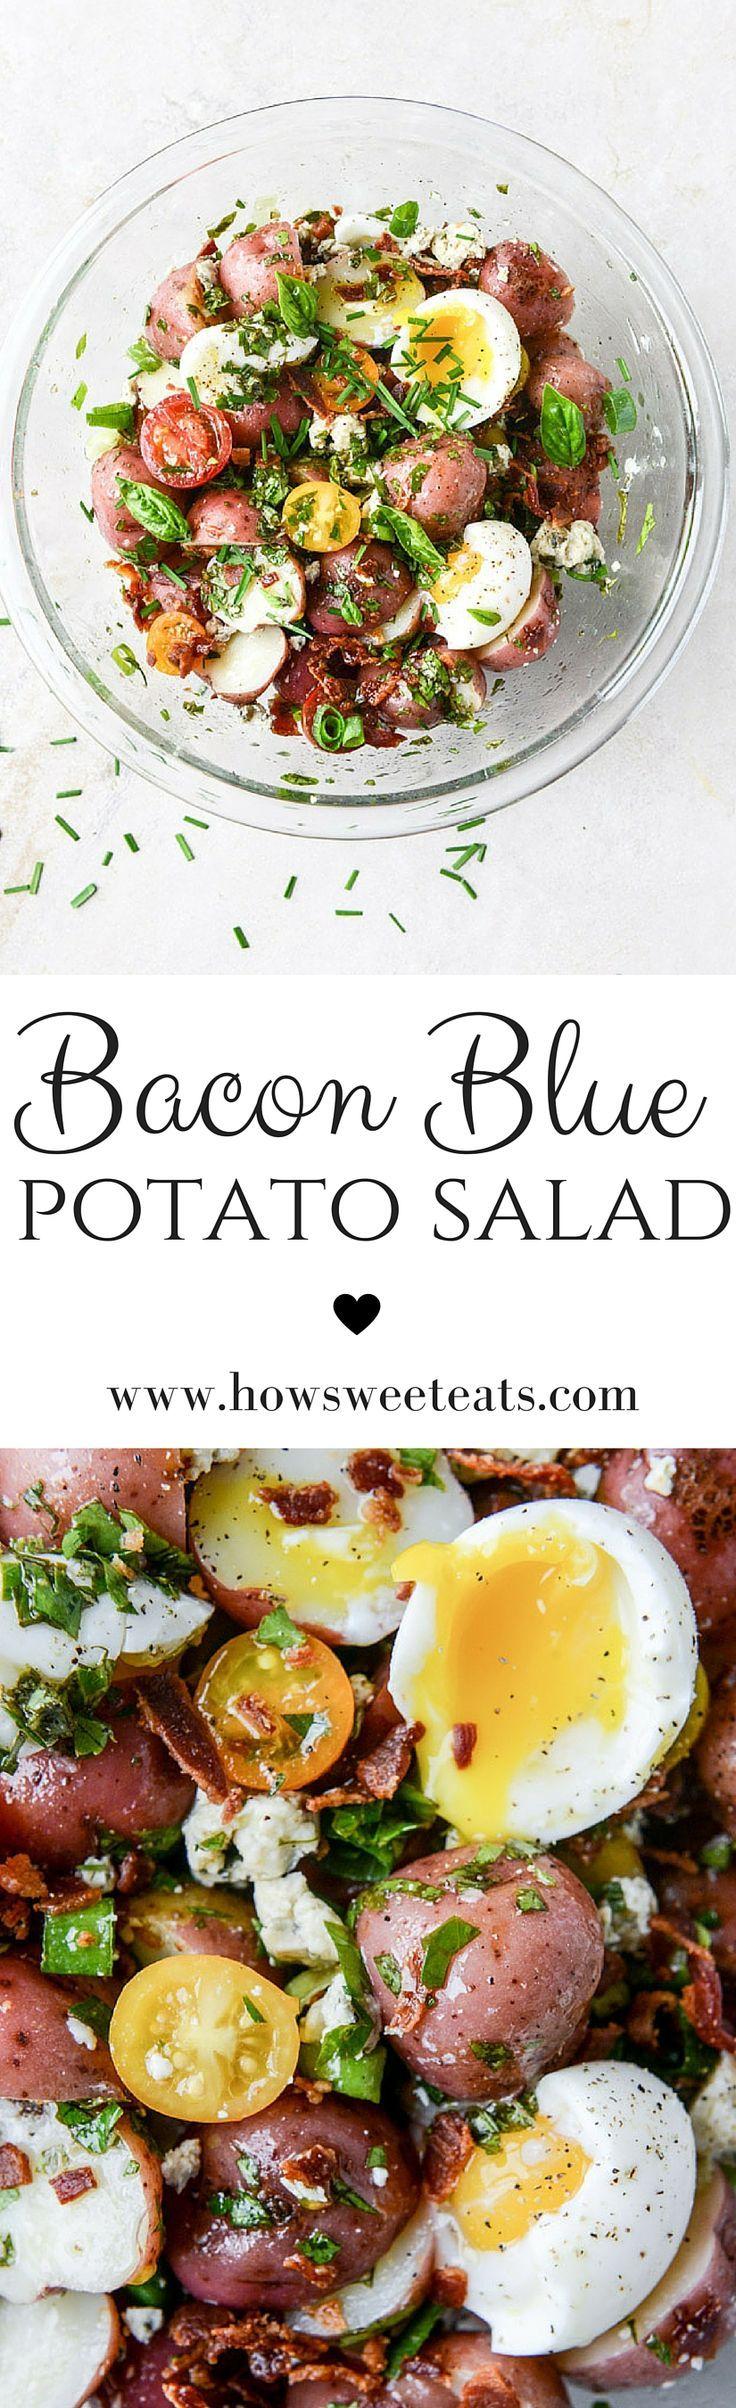 bacon blue potato salad with soft boiled eggs I howsweeteats.com